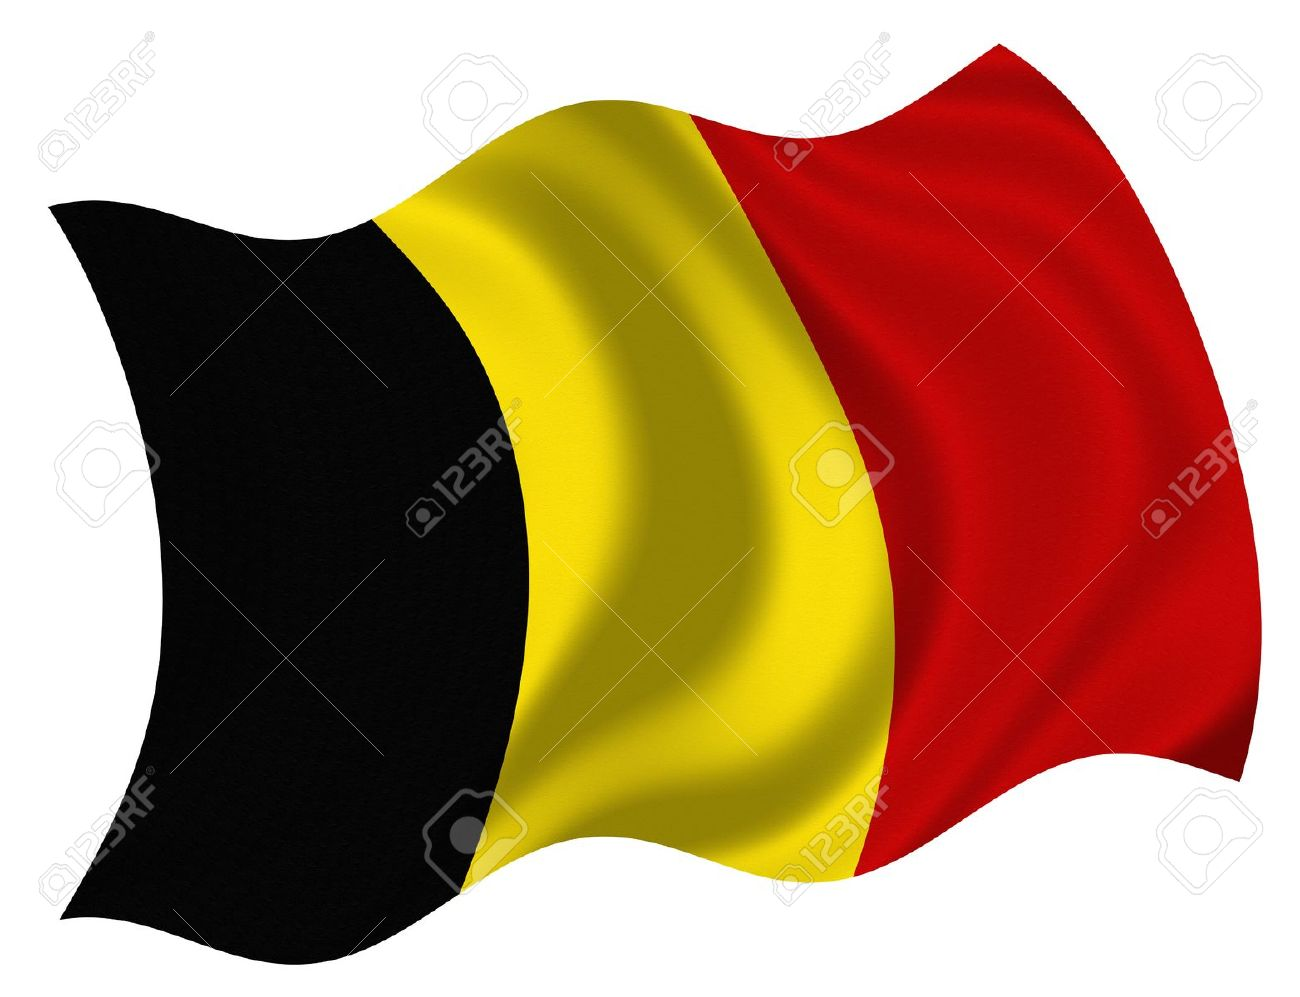 Flag Of Belgium Backgrounds on Wallpapers Vista